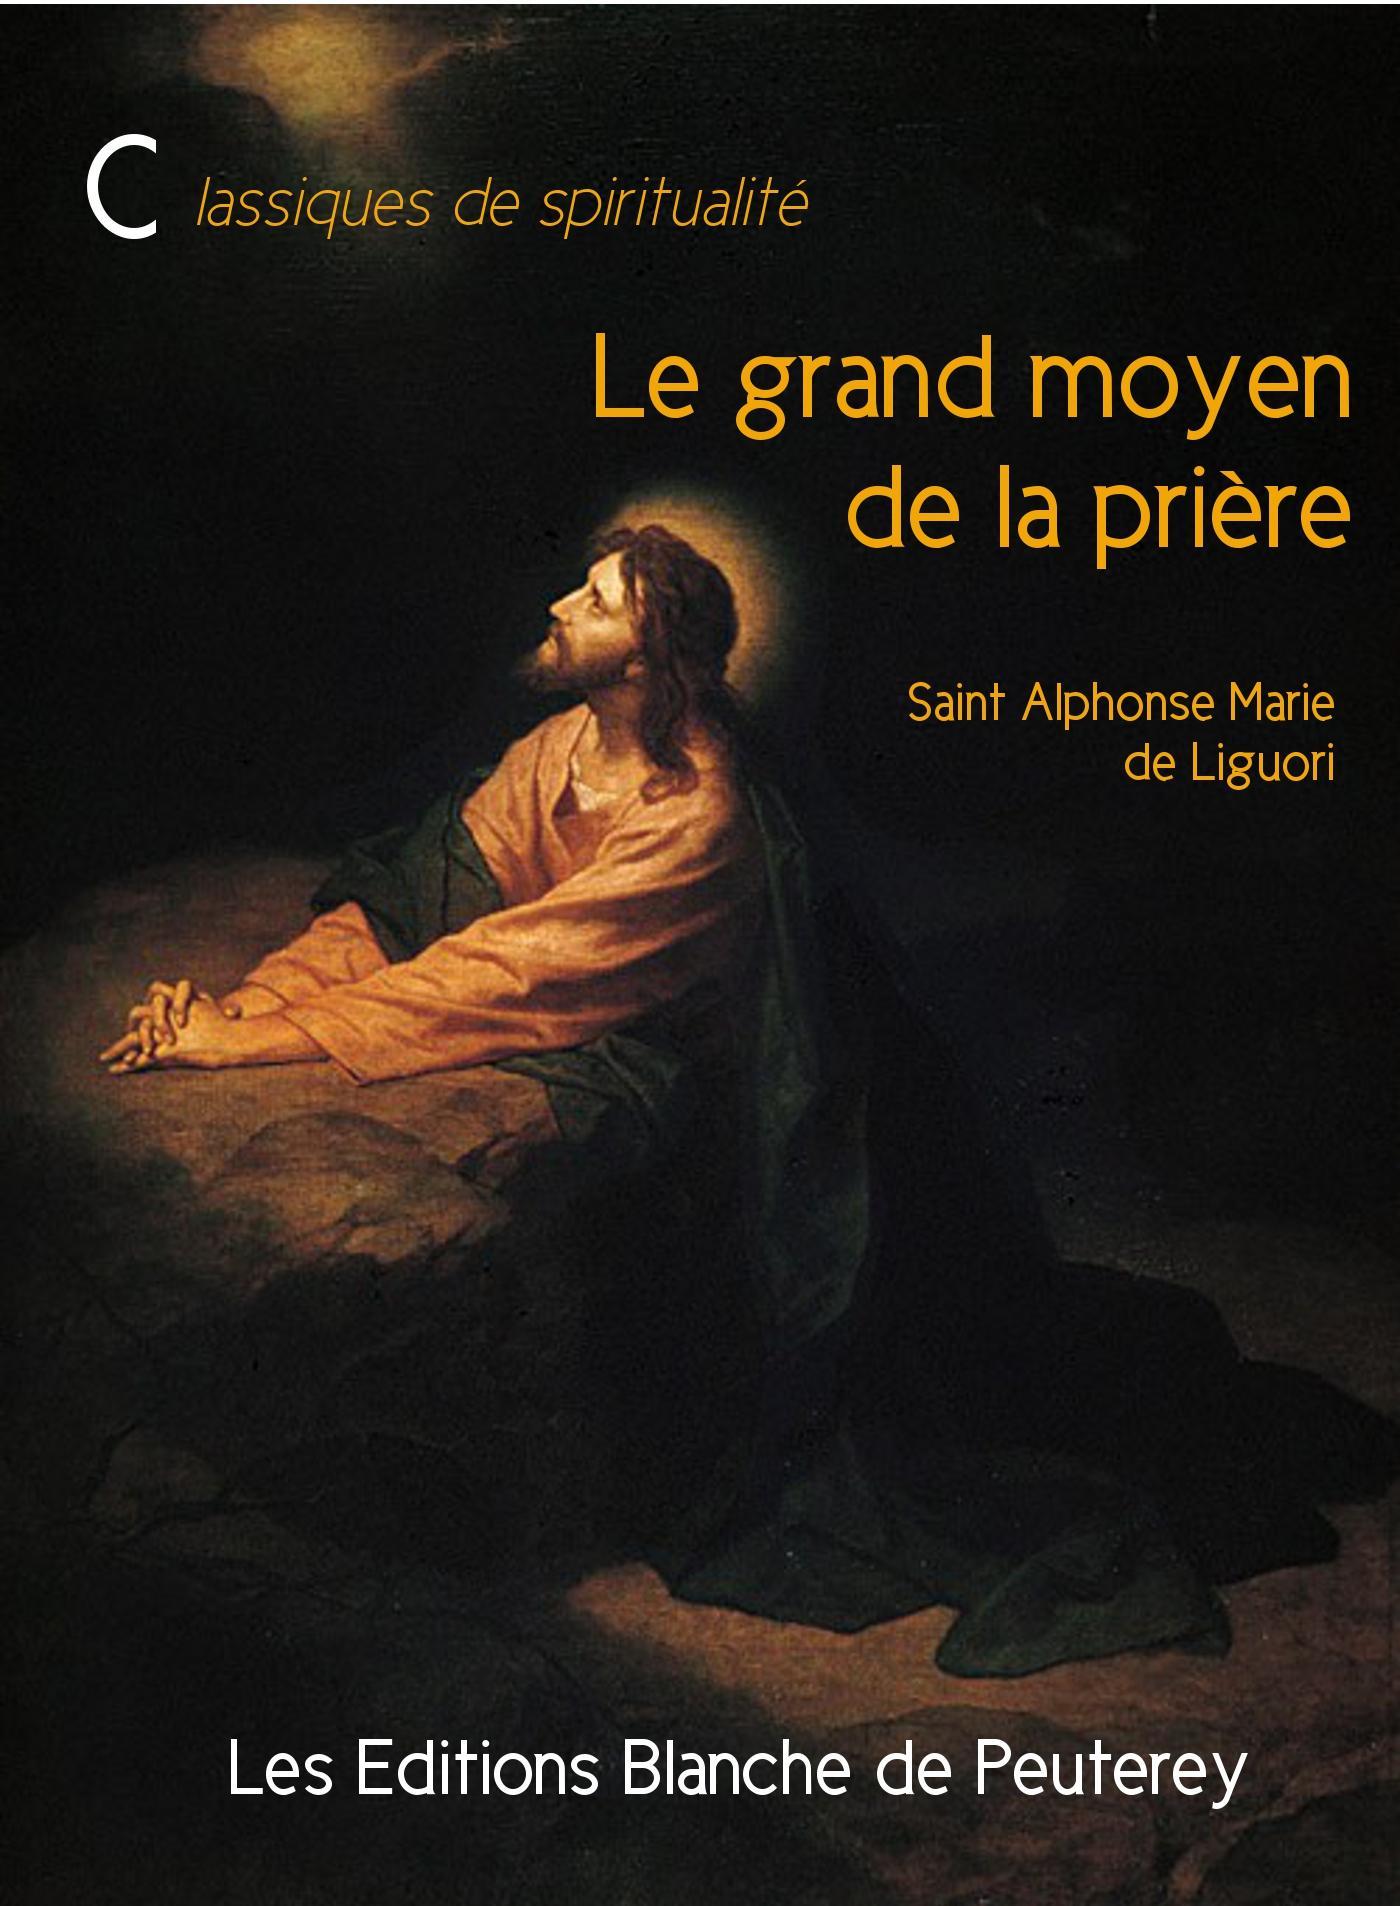 Le grand moyen de la prière